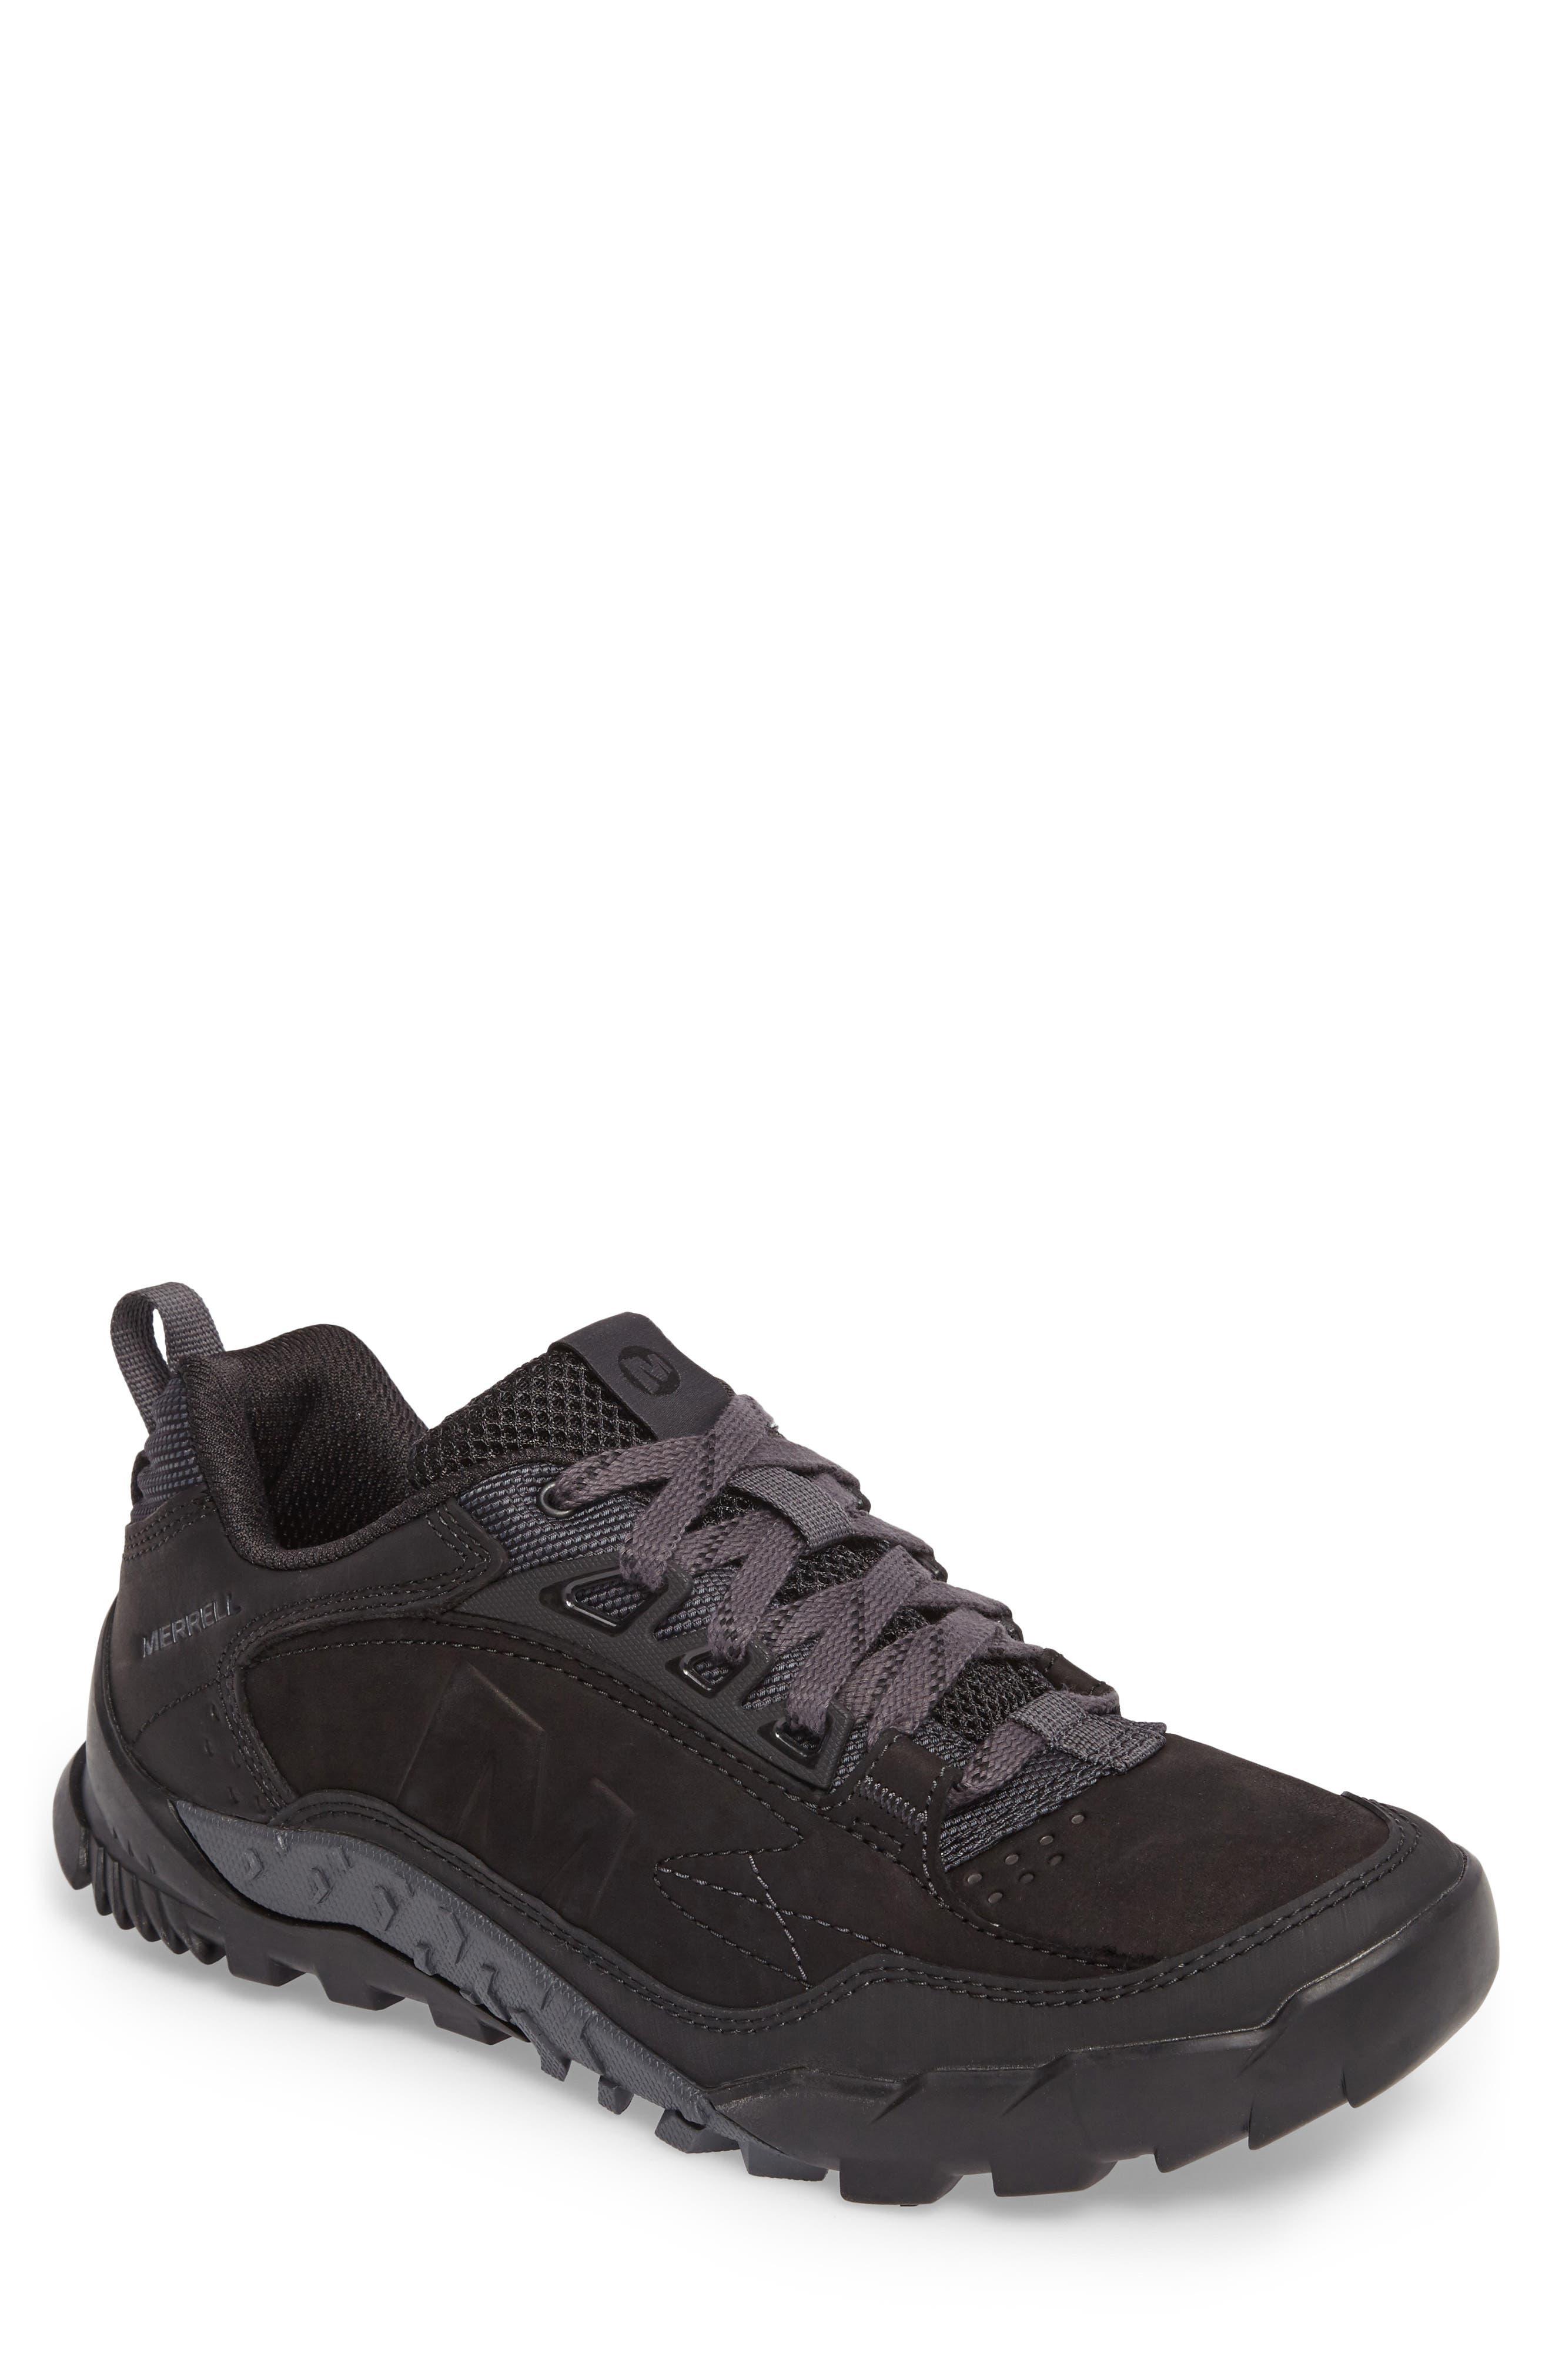 Annex Tak Low Hiking Shoe,                             Main thumbnail 1, color,                             BLACK NUBUCK LEATHER